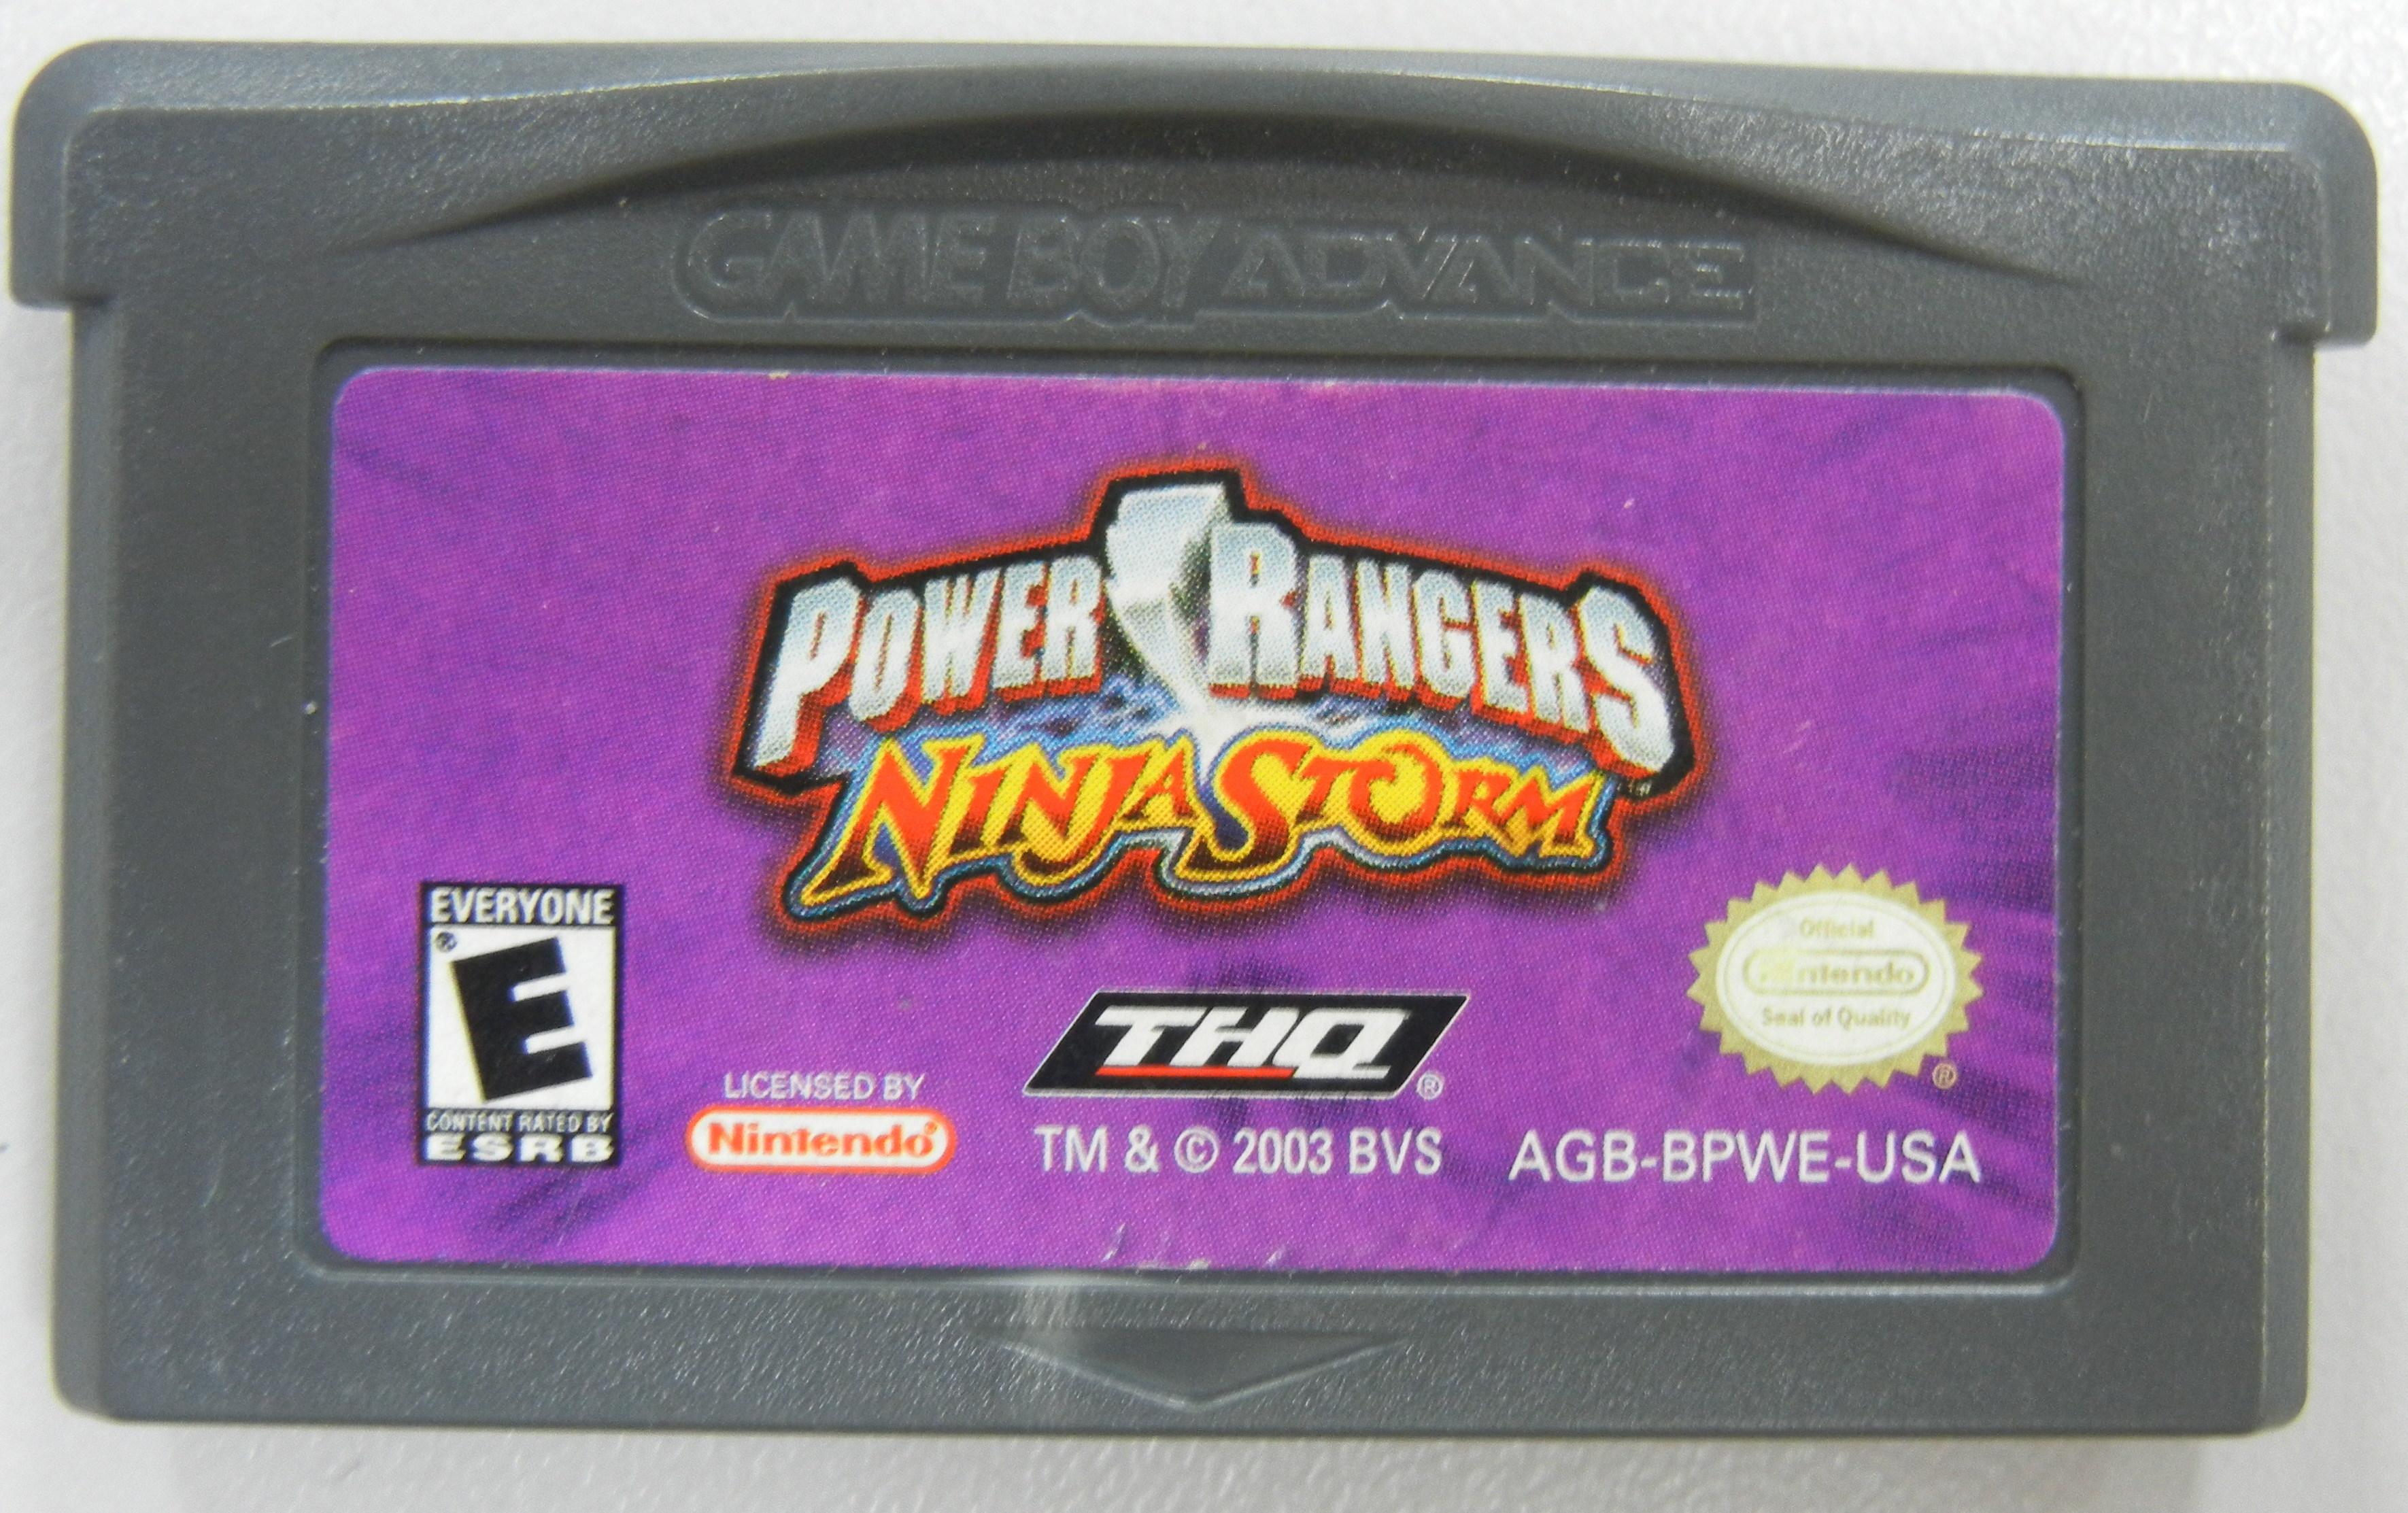 POWER RANGERS NINJA STORM - GAMEBOY ADVANCE GAME